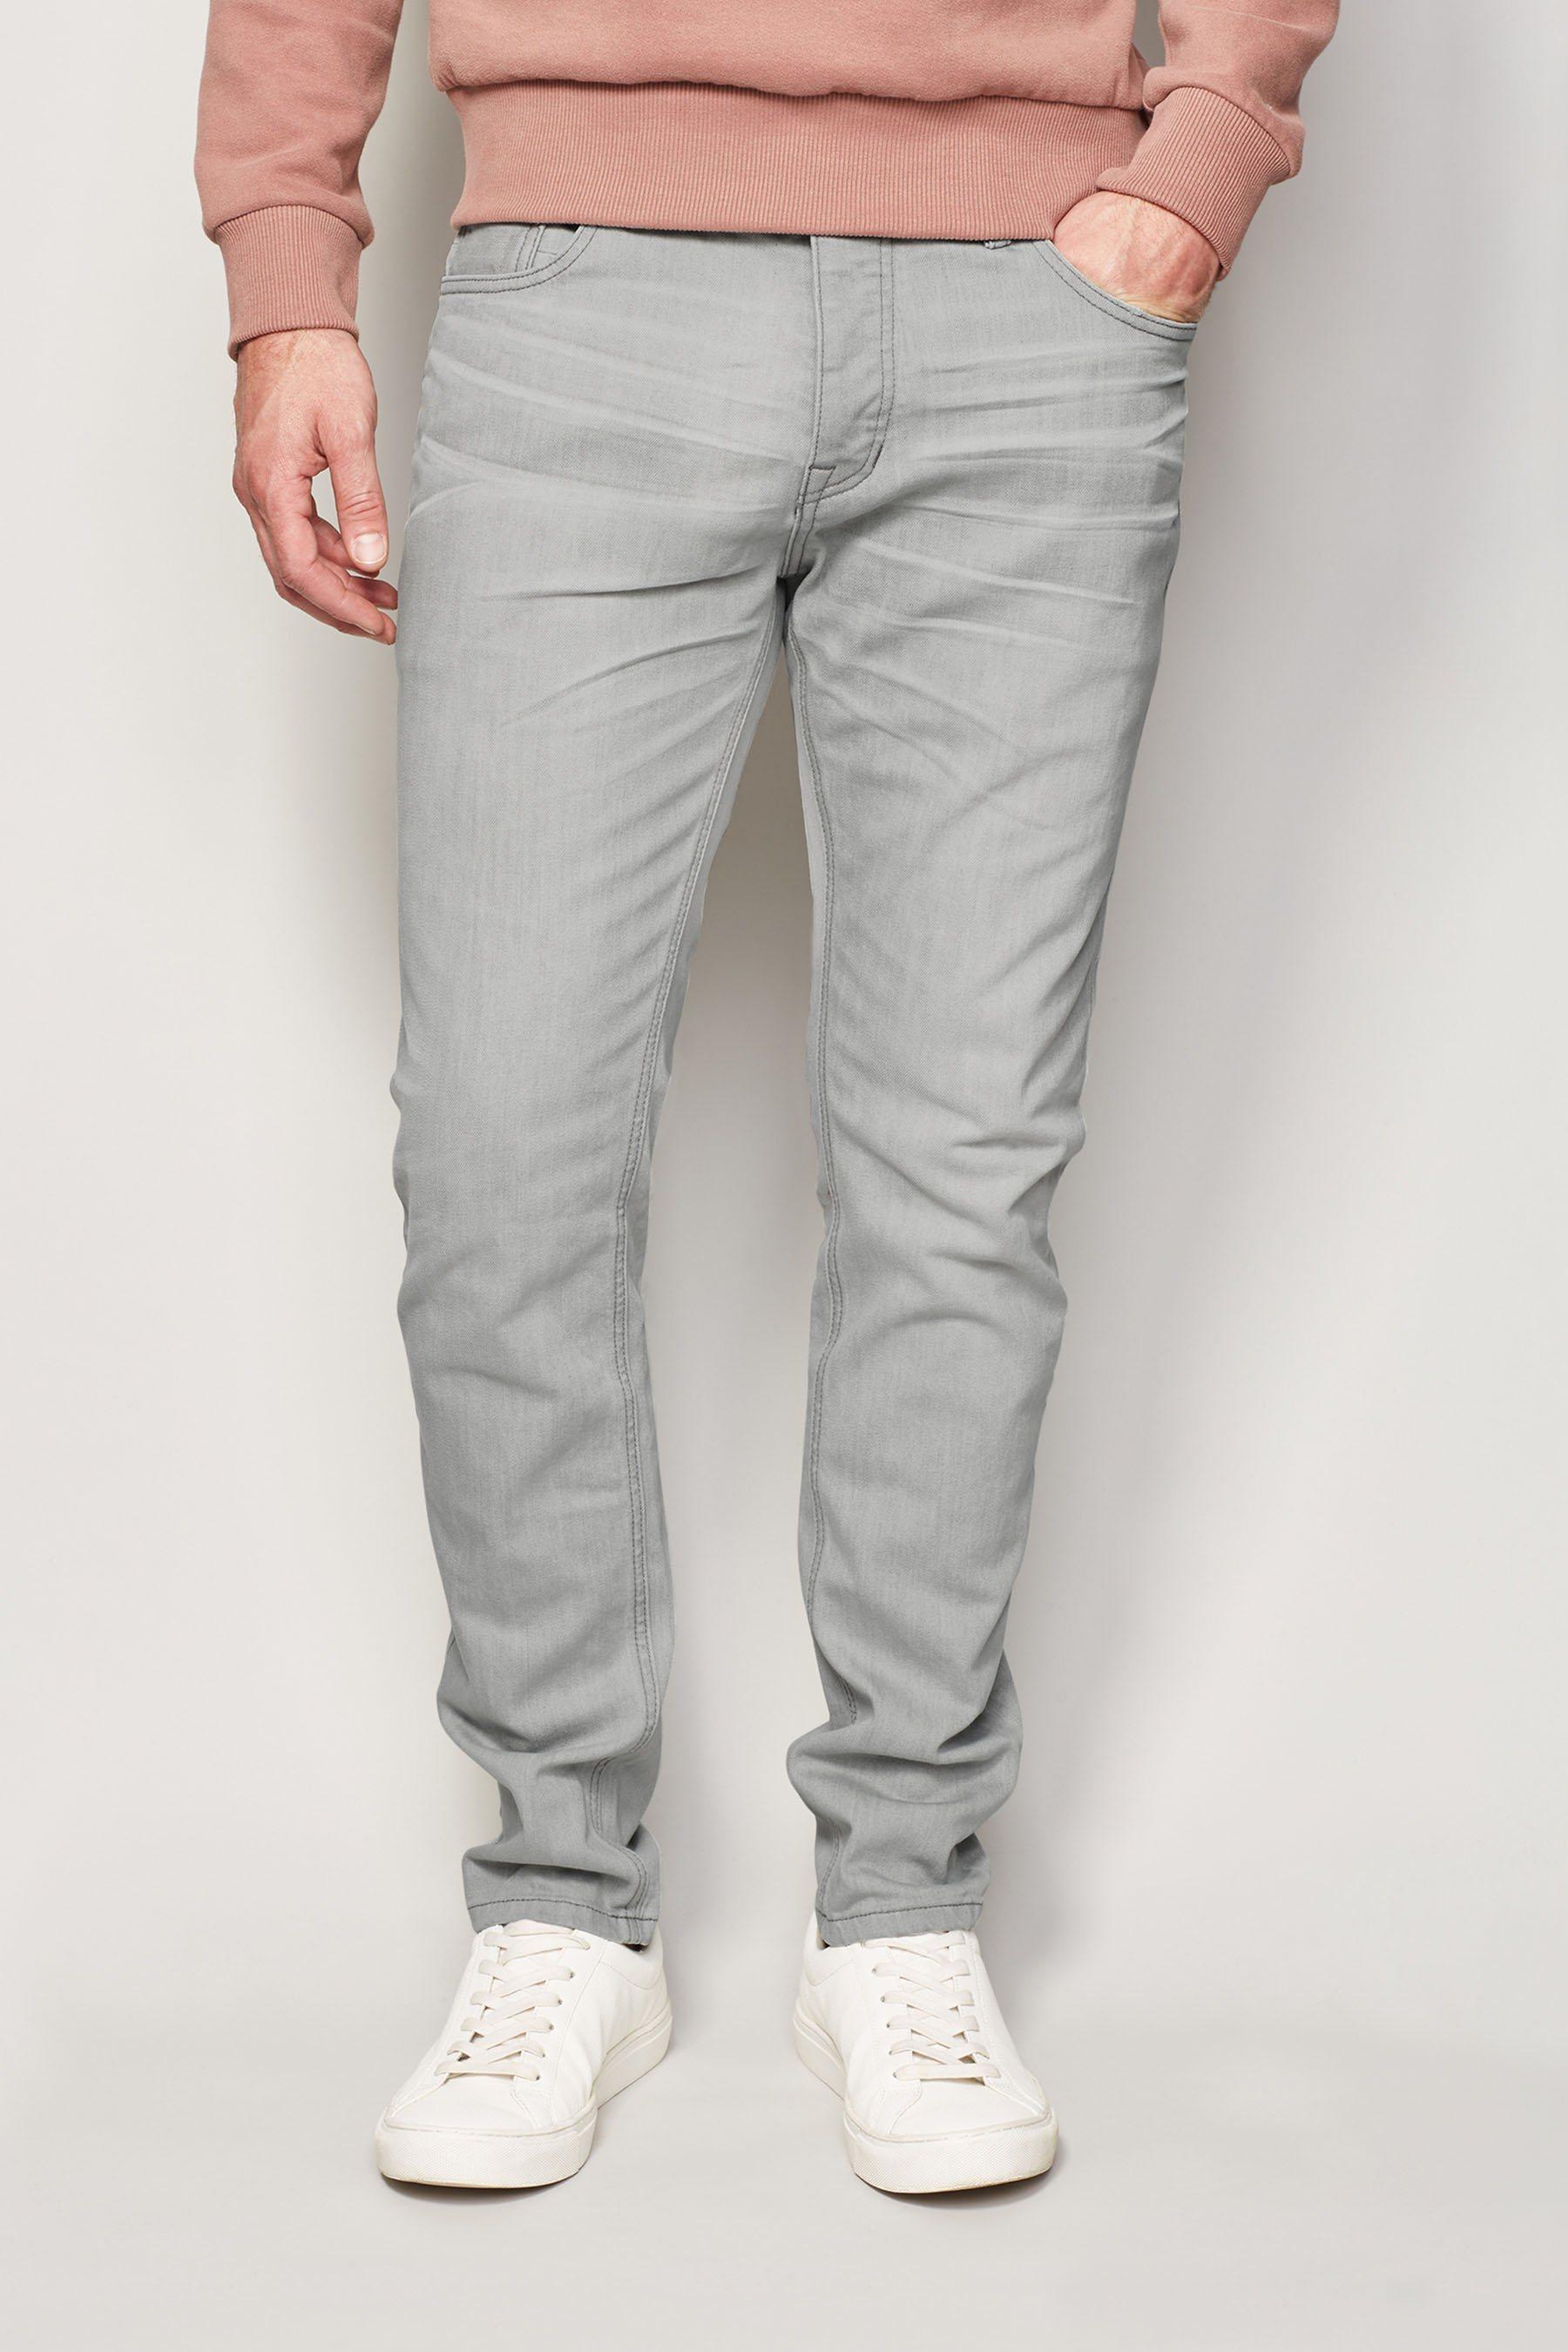 Next Skinny-Fit Light Grey Stretch-Jeans